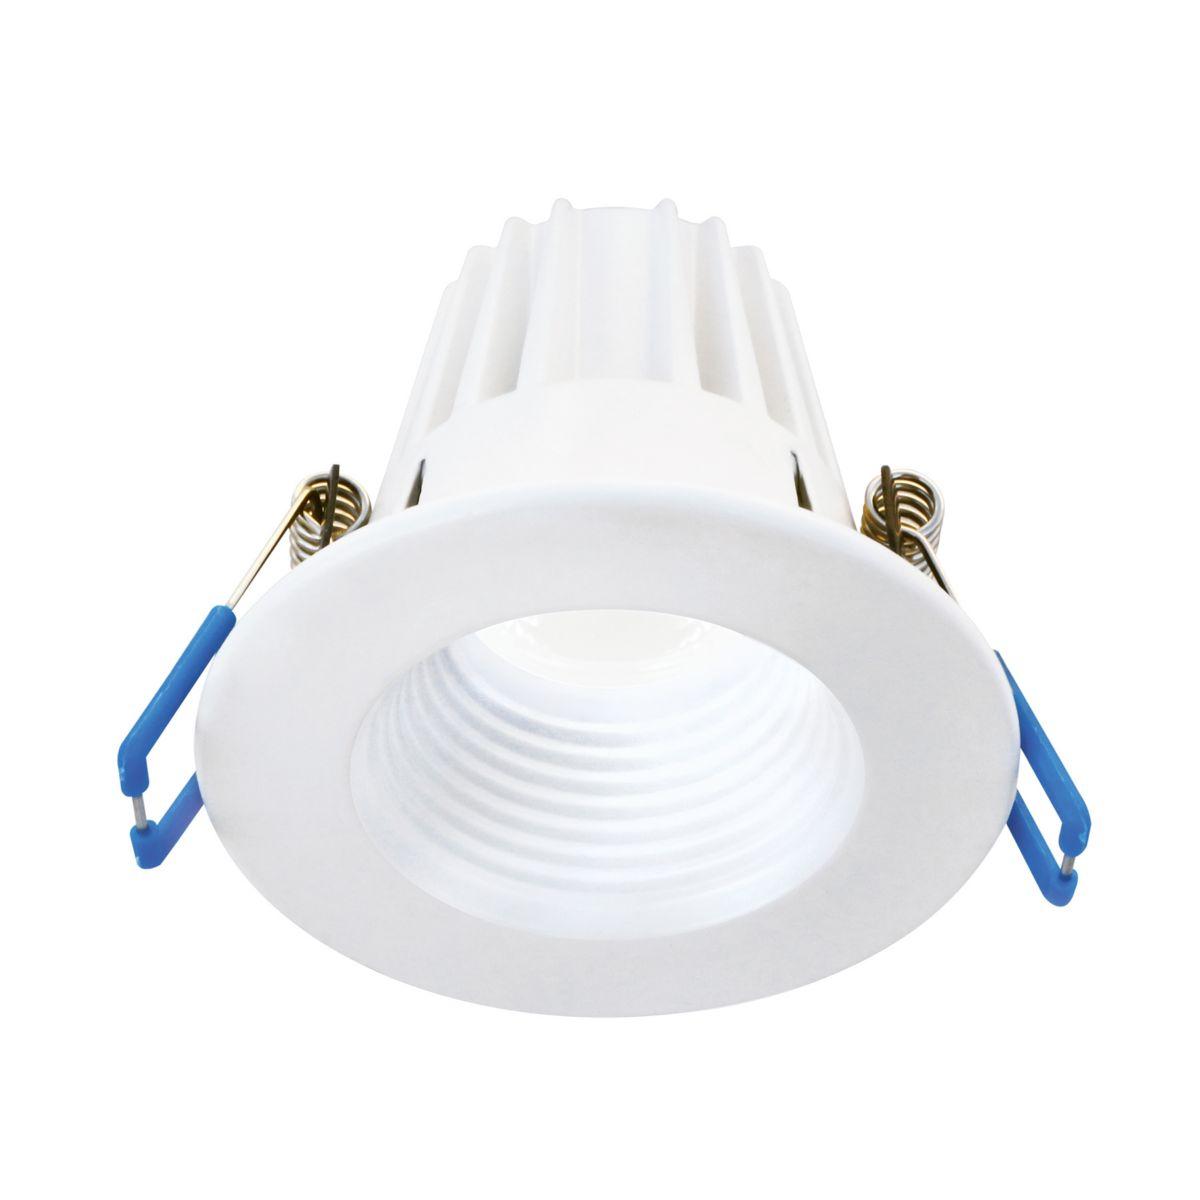 Lightolier MD3R069301FW